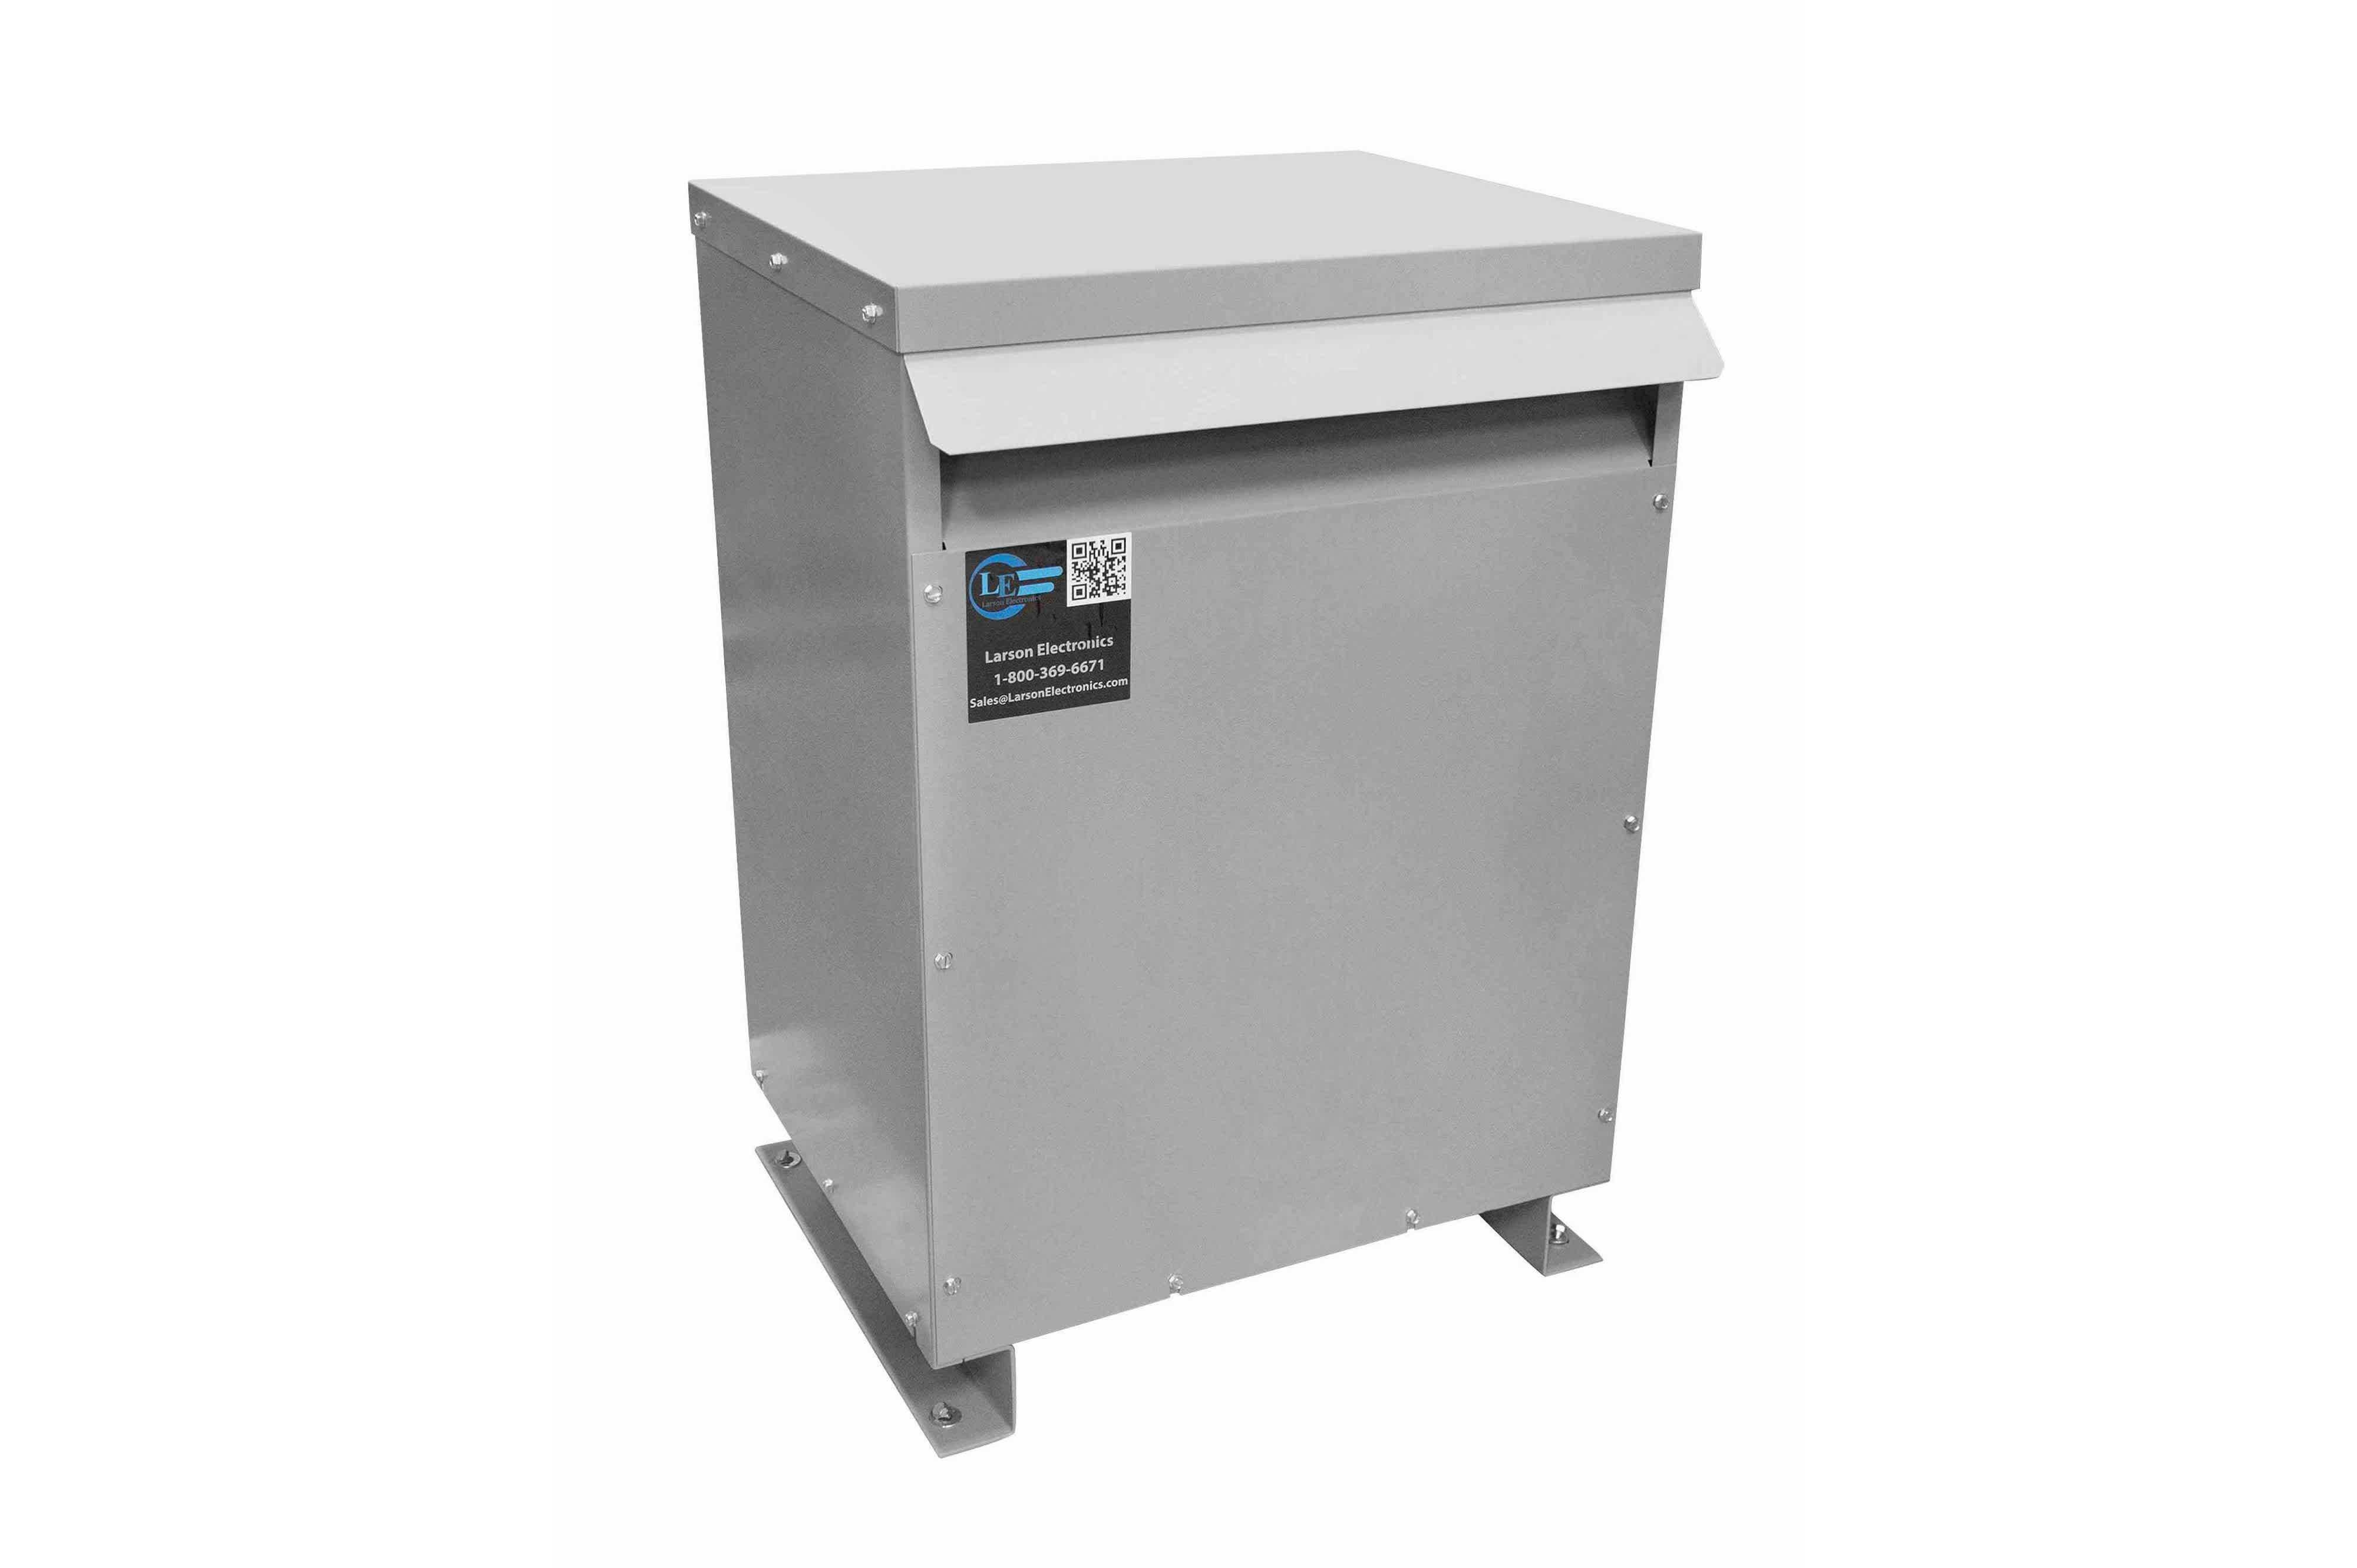 800 kVA 3PH Isolation Transformer, 415V Wye Primary, 240V/120 Delta Secondary, N3R, Ventilated, 60 Hz